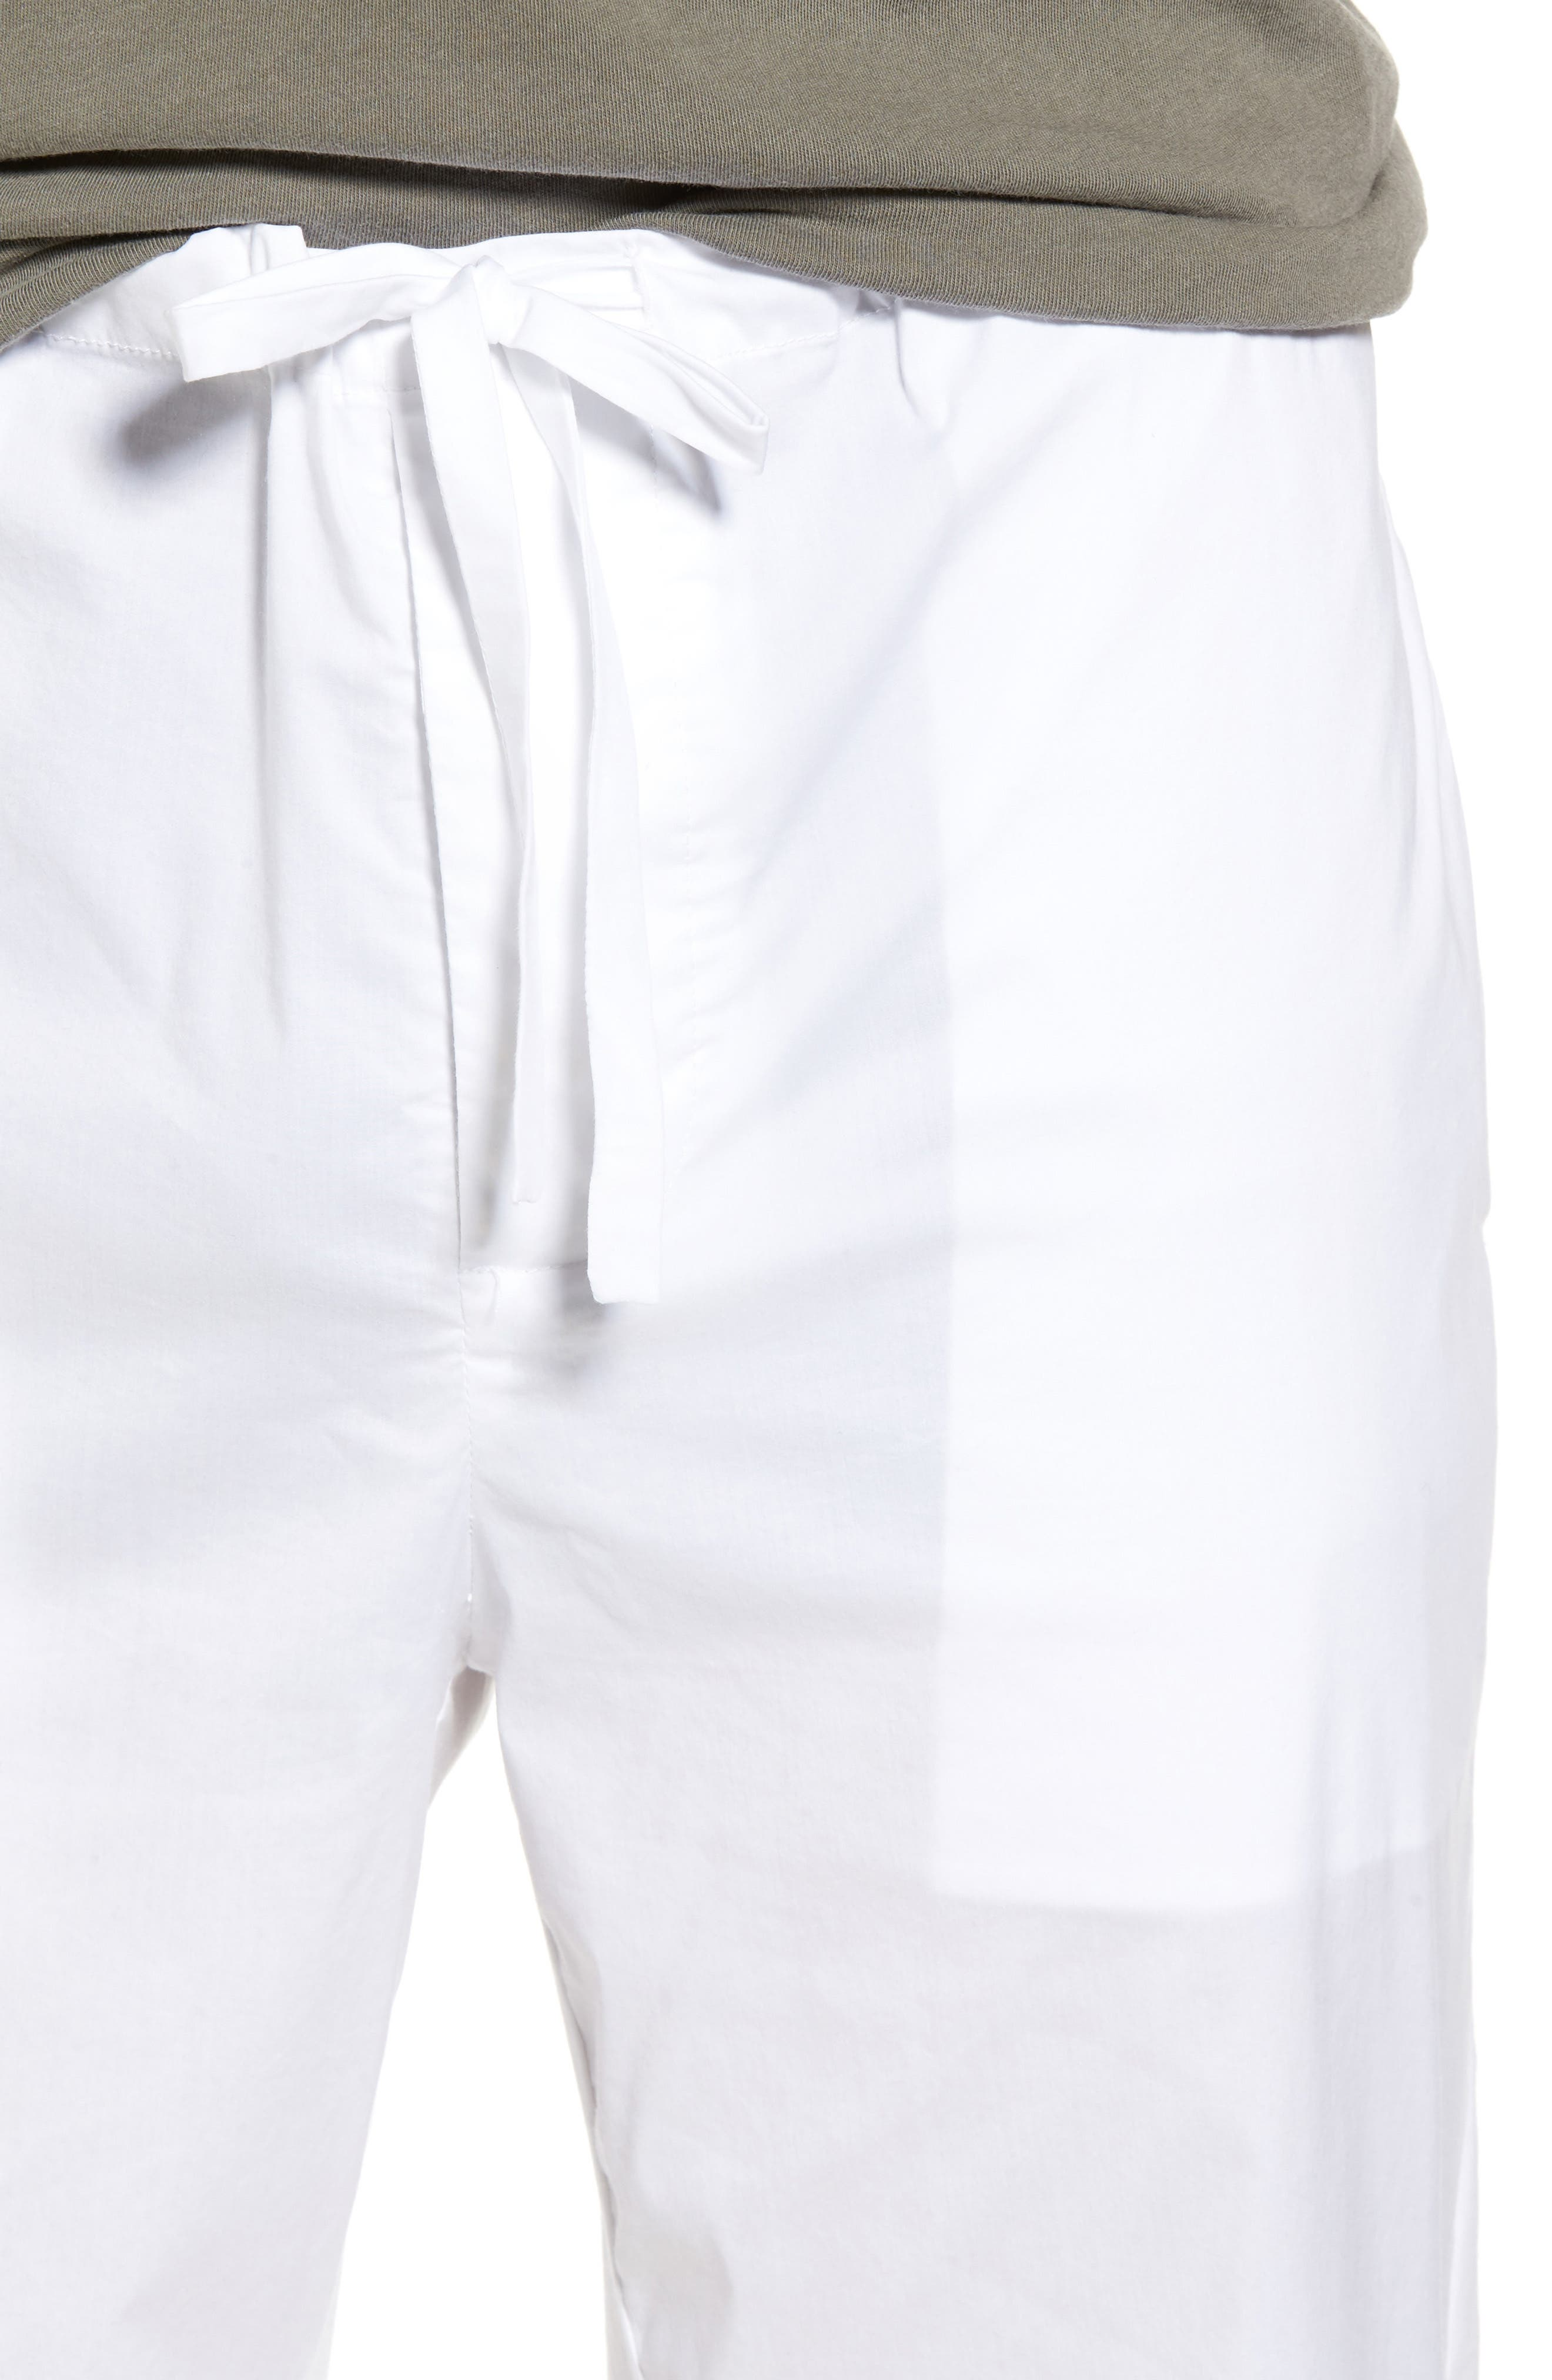 Drawstring Waist Pants,                             Alternate thumbnail 4, color,                             White